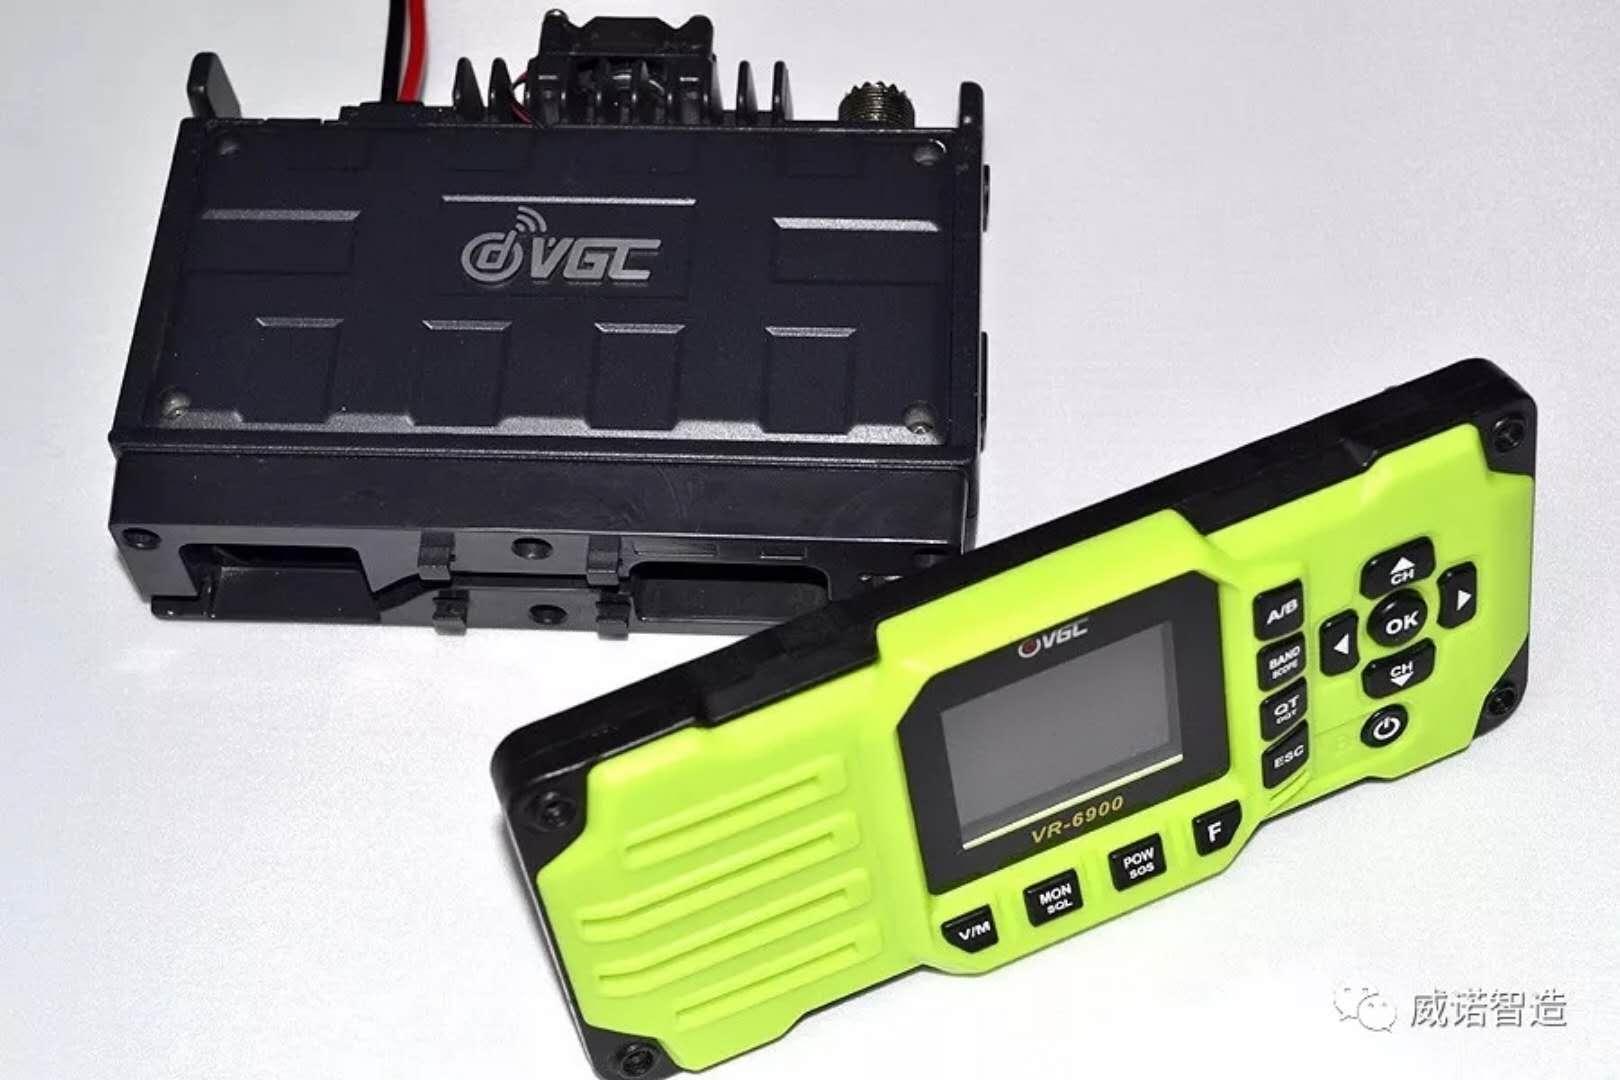 VR-6900 Mobile Radio